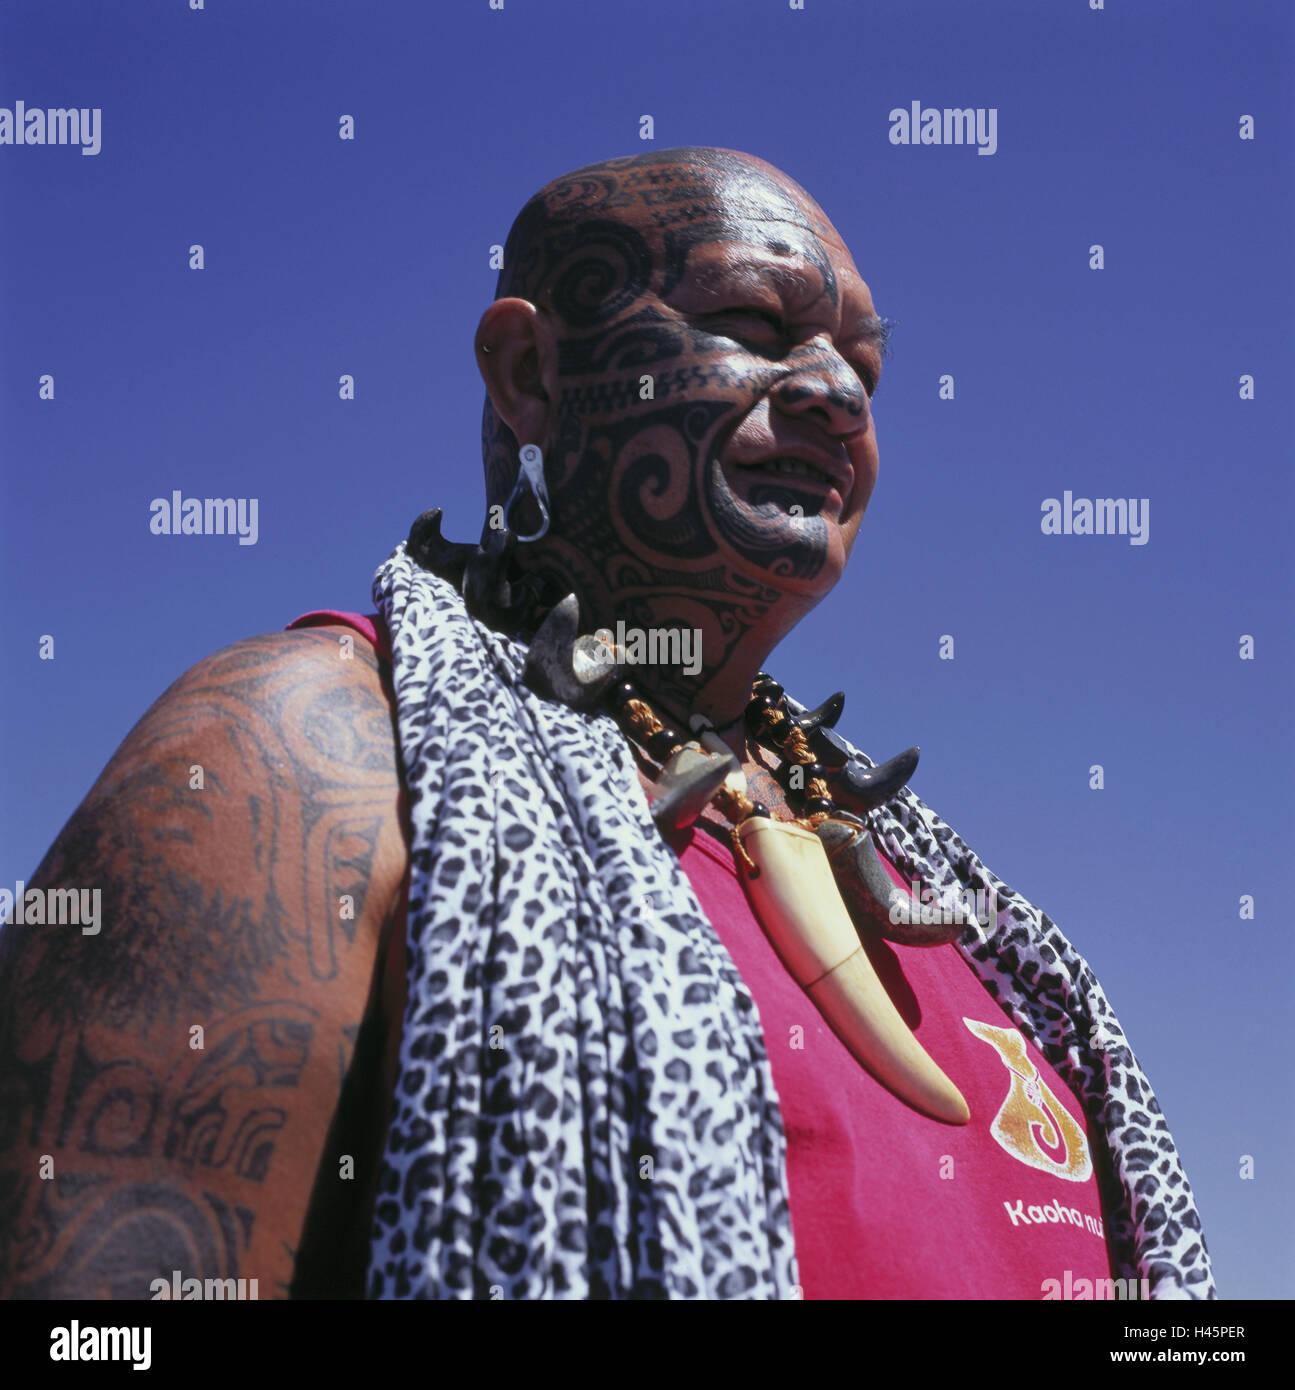 French Polynesia Country Part - 48: French Polynesia, Ua Pou, Man, Portrait, Person, Local, Dark-skinned,  Polynesian, Tattoos, Neck Jewellery, Tradition, Typically For Country,